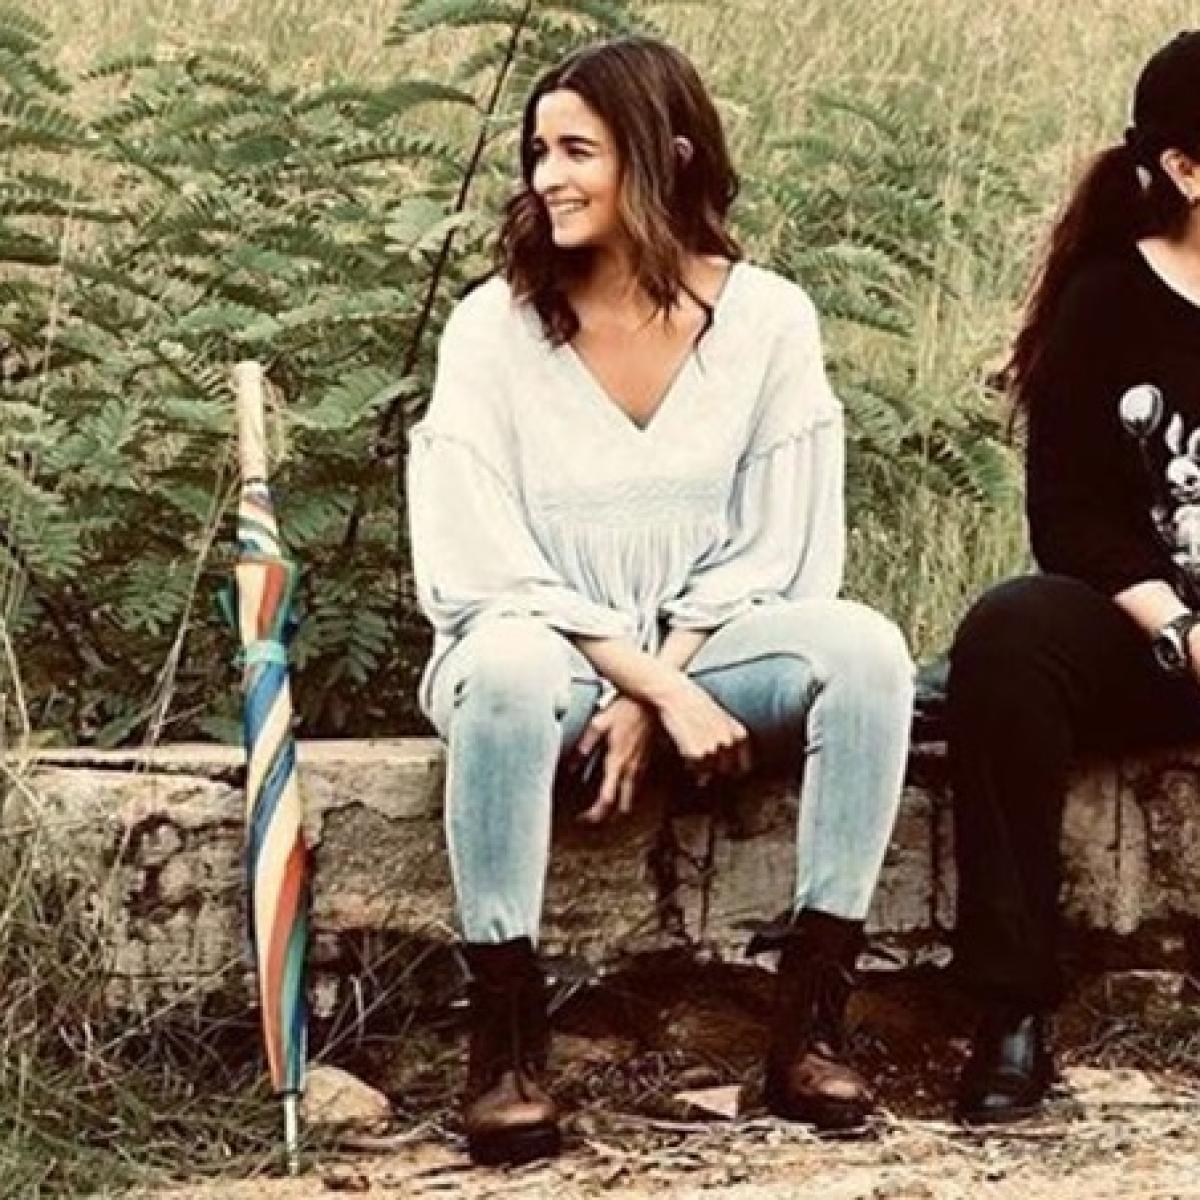 Alia Bhatt shares 'priceless moment' with Pooja Bhatt on the sets of 'Sadak 2'